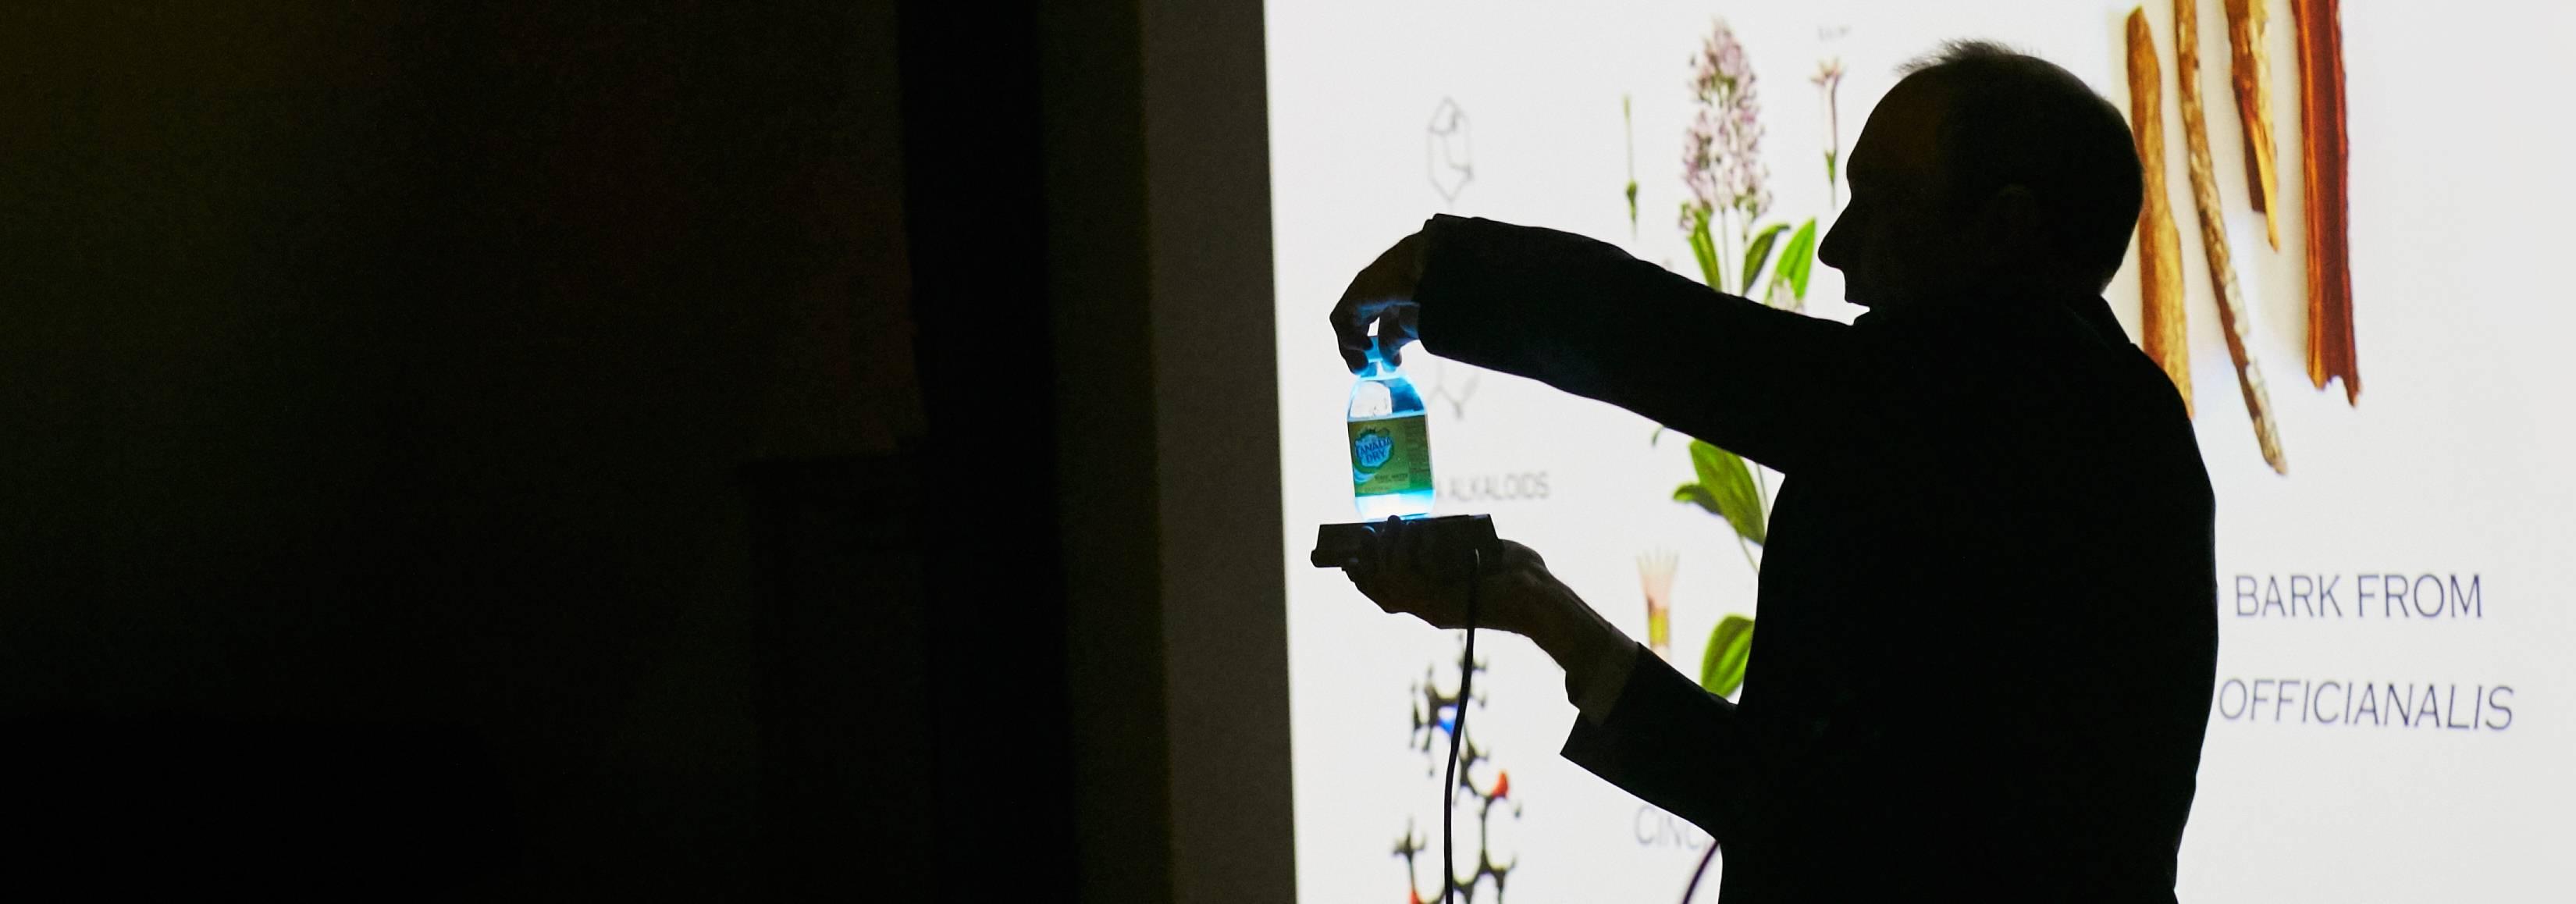 Silhouette of scientist shining blue light under liquid in bottle